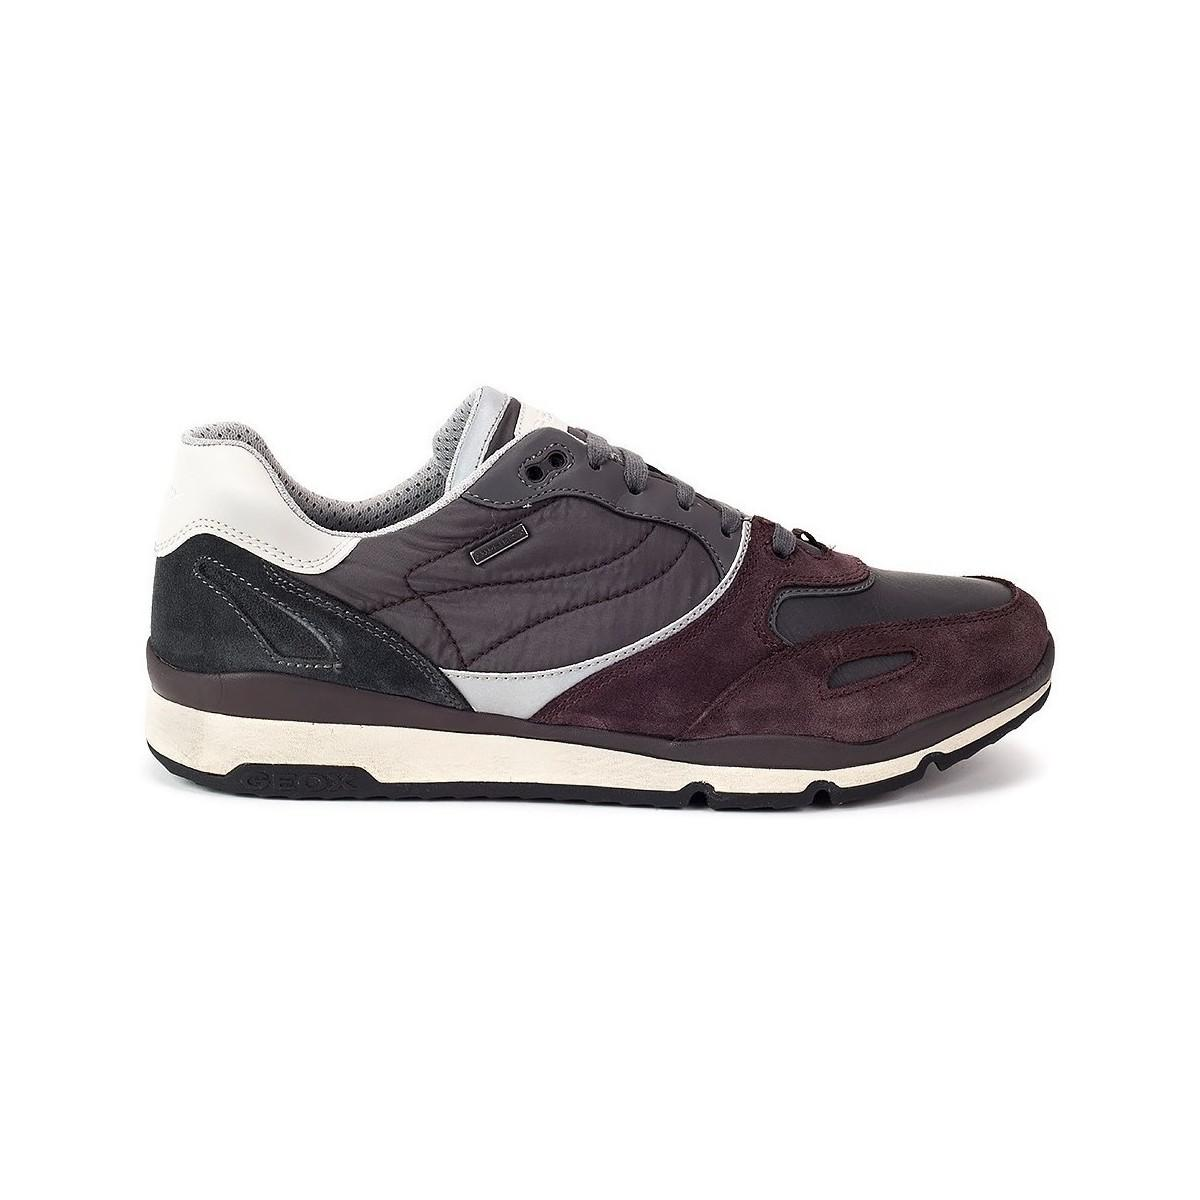 Sandford ABX sneakers - Multicolour Geox pf0FWH4eil